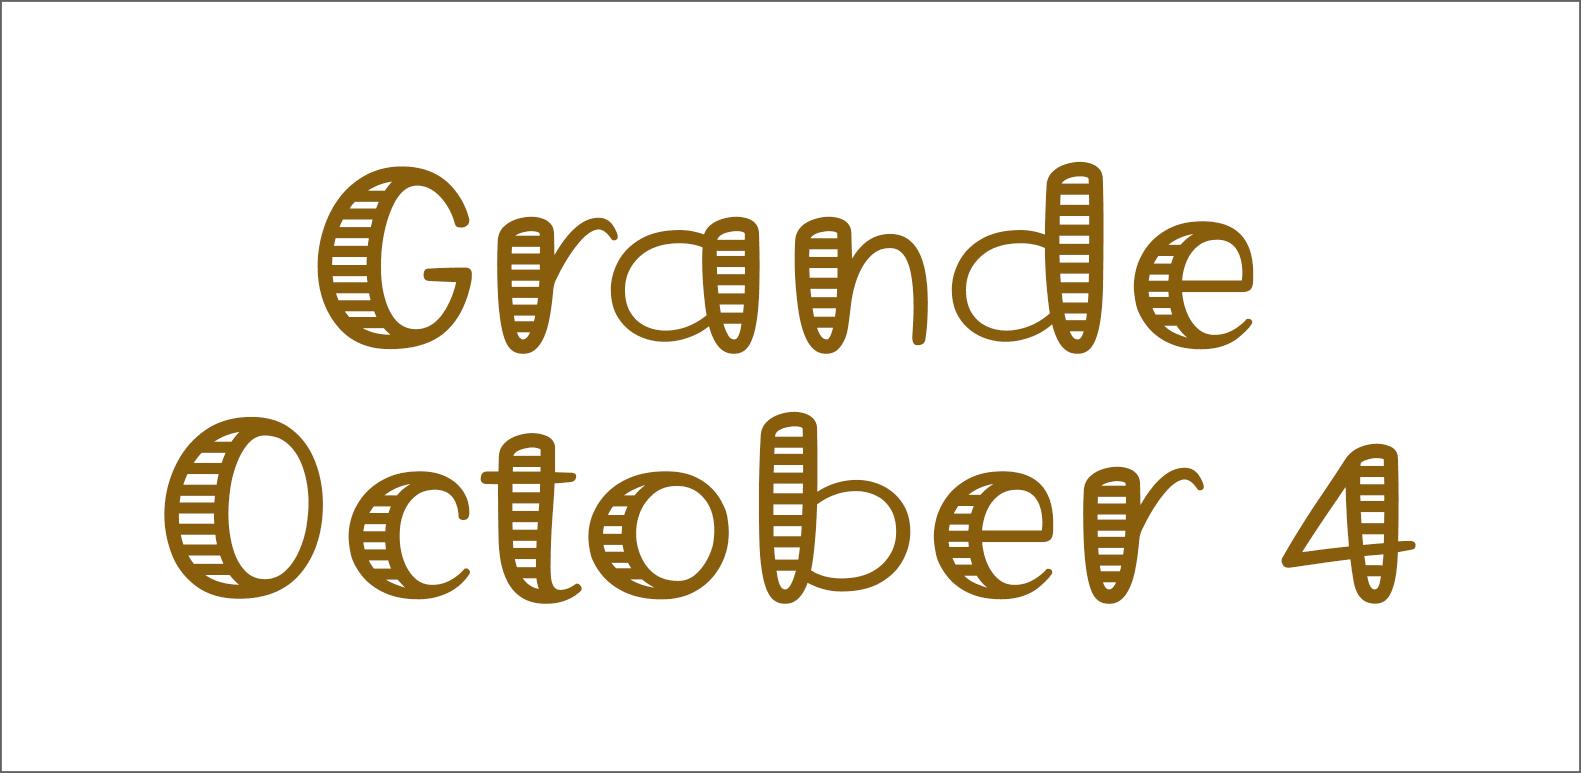 Grande October 4 font